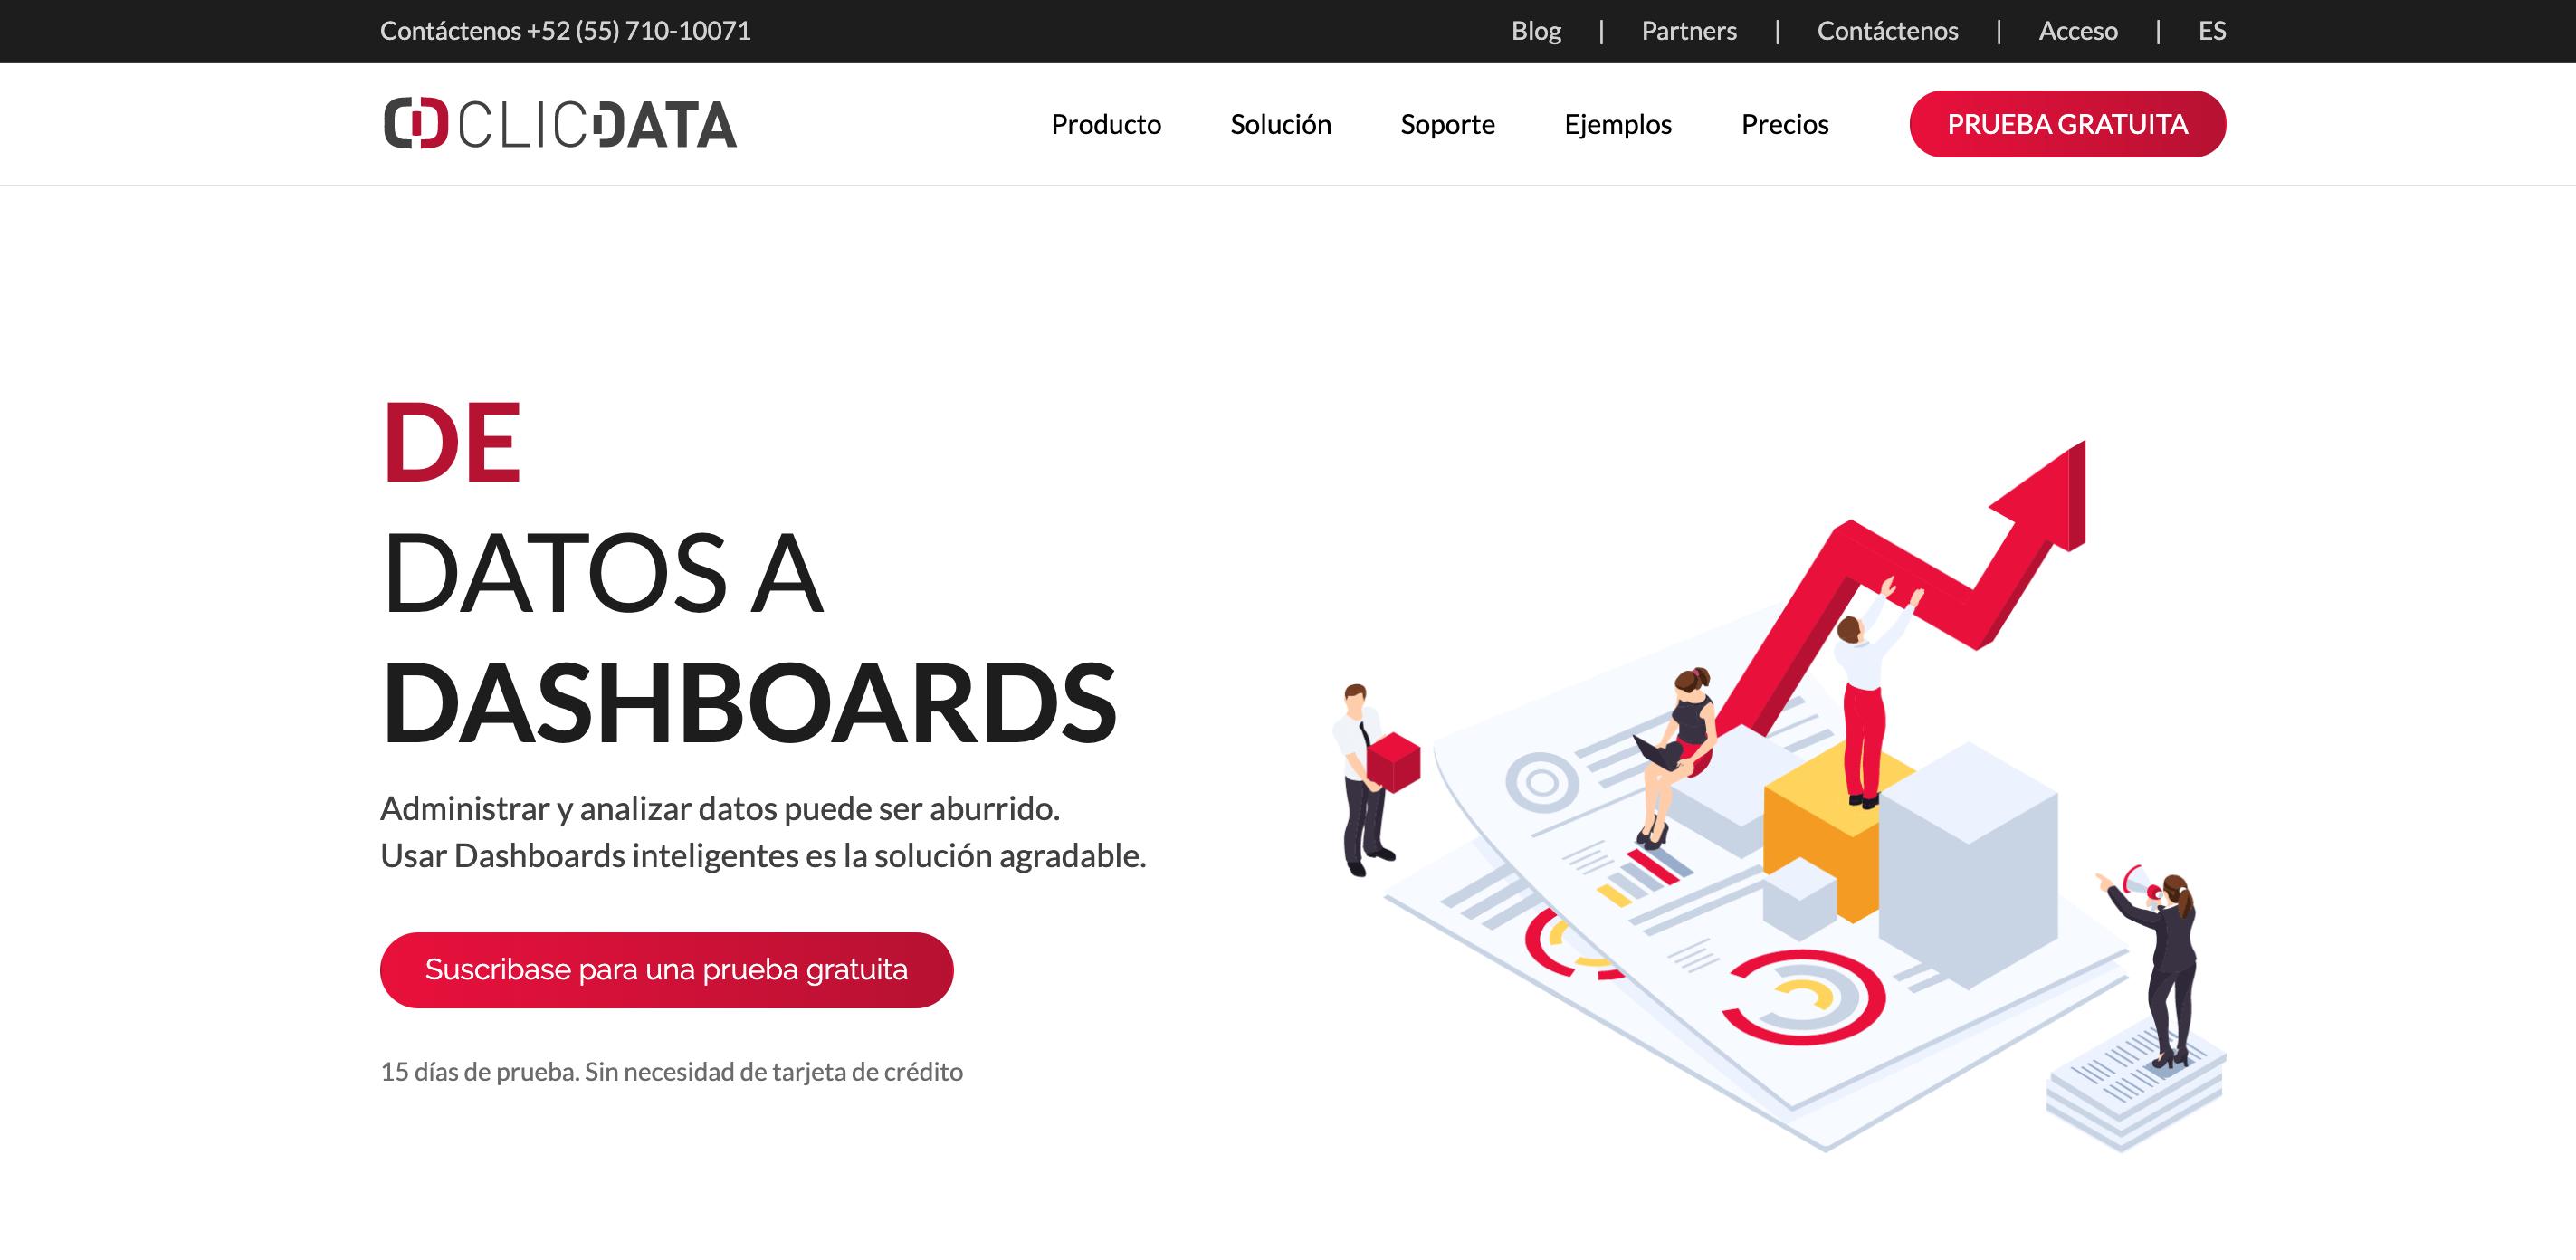 clicdata-software-intelegencia-de-negocios